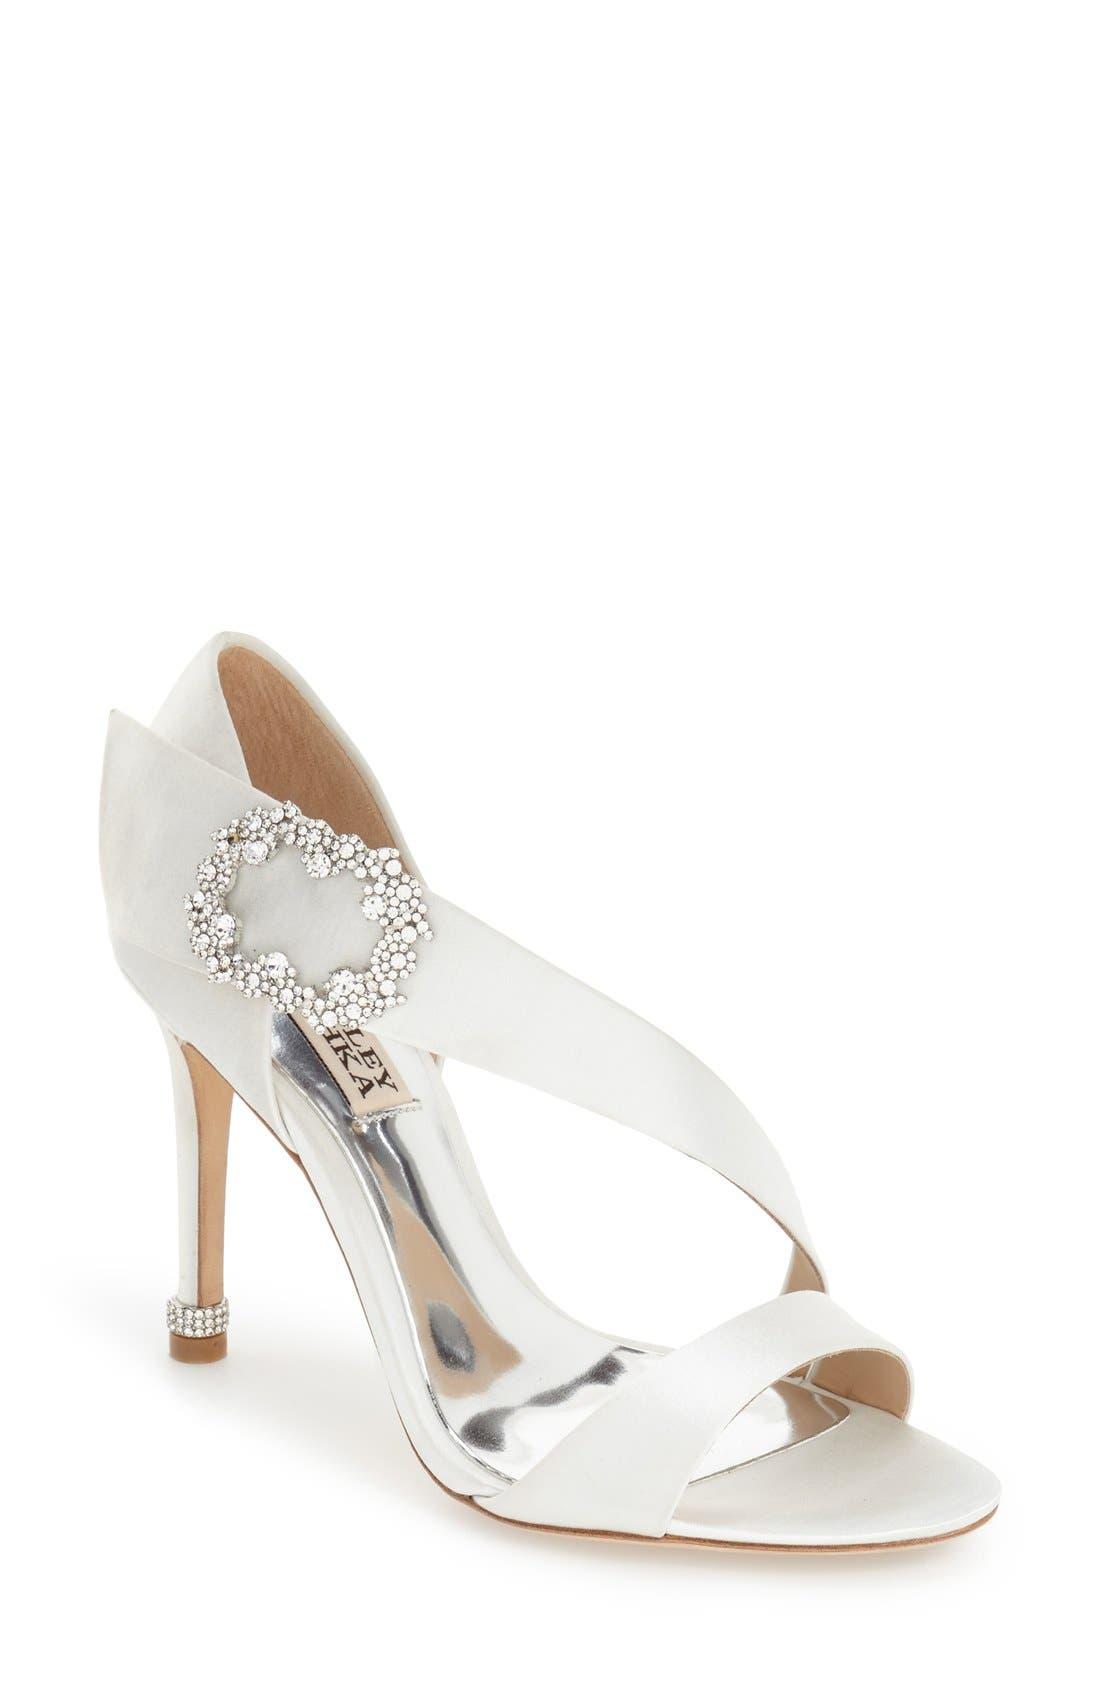 Alternate Image 1 Selected - Badgley Mischka 'Night' Crystal Embellished Evening Sandal (Women)